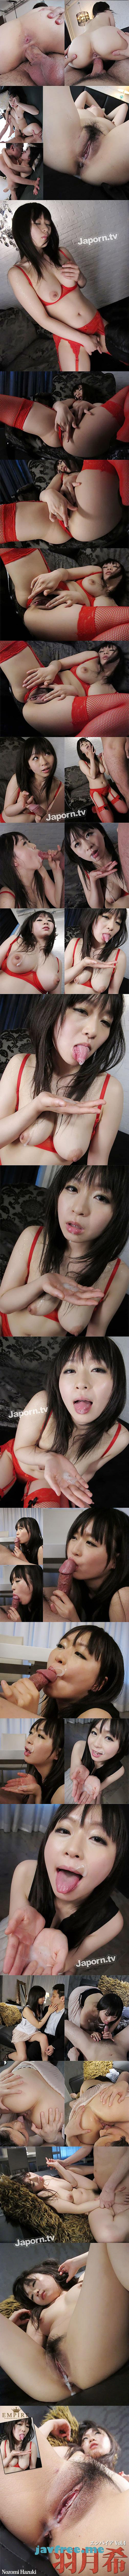 [EMP 005] エンパイア Vol.5 ~淫乱美麗 ~ : 羽月希 羽月希 Nozomi Hazuki EMP